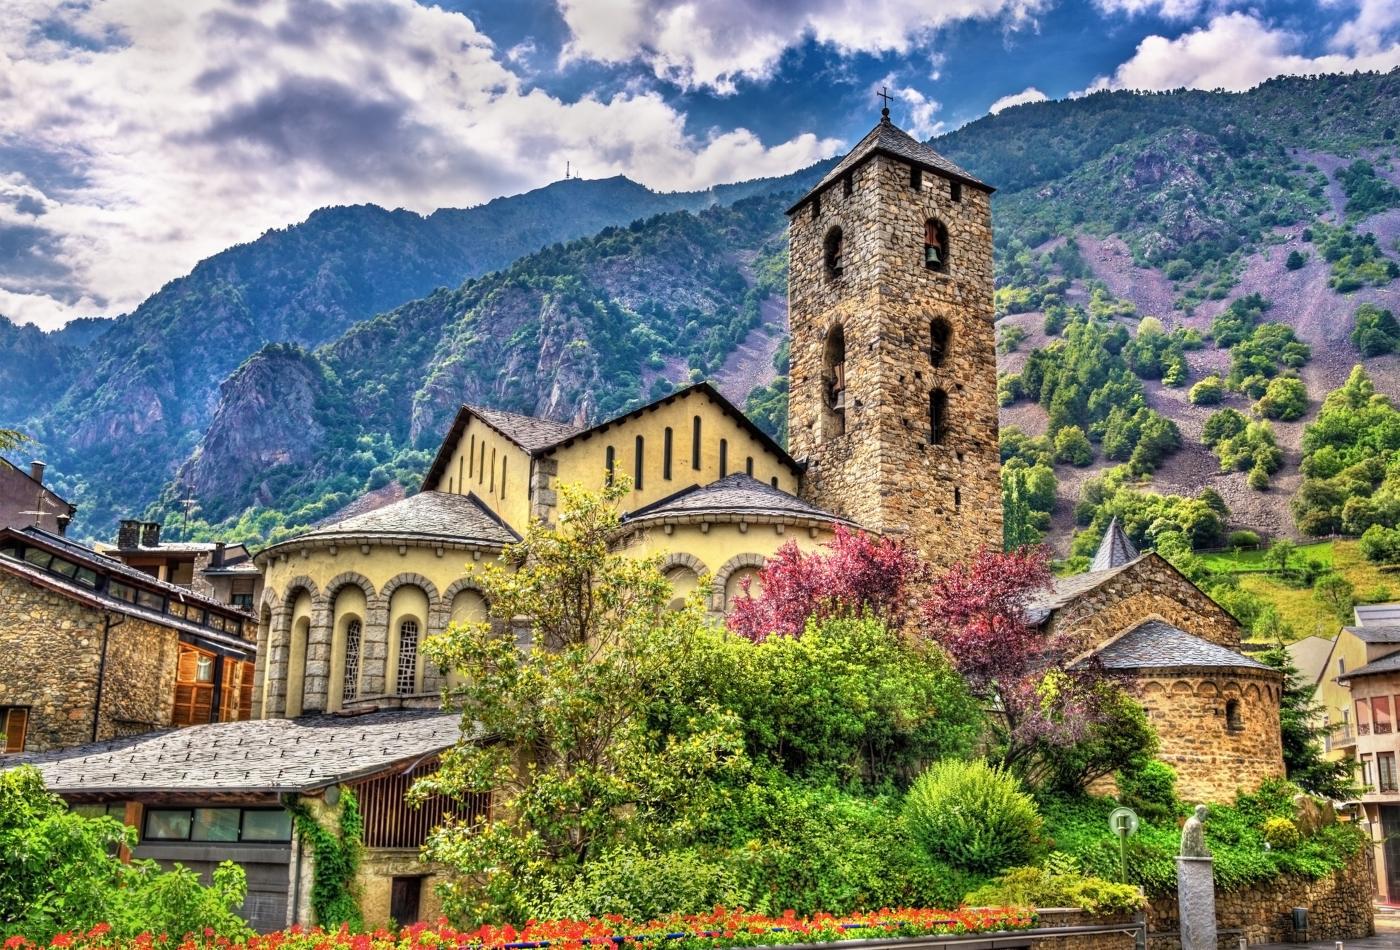 Catedral de Andorra